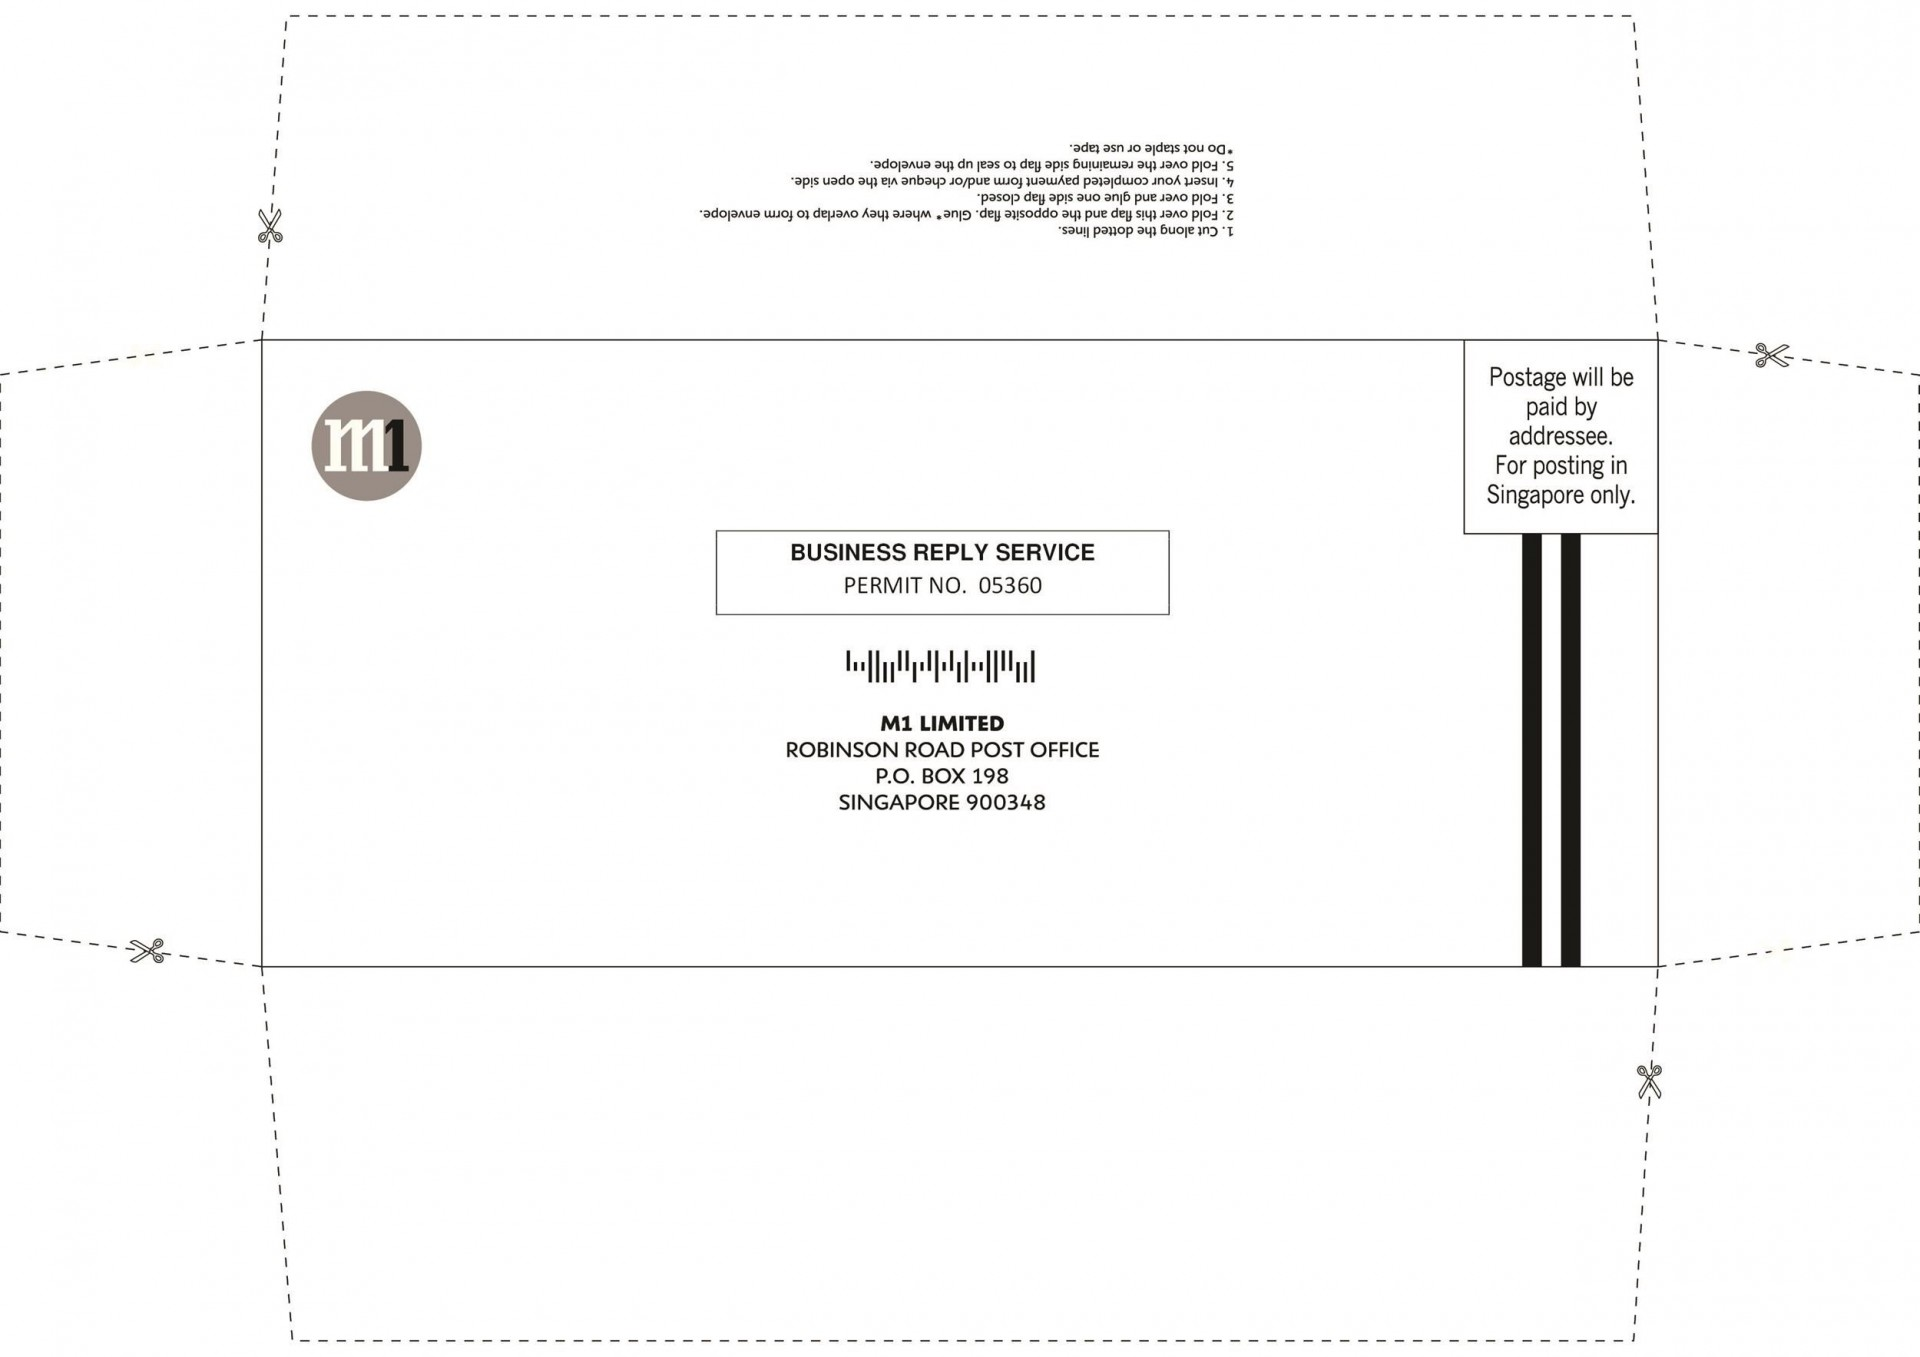 004 Rare 10 Envelope Template Word Photo  Size Microsoft #10 Double Window1920